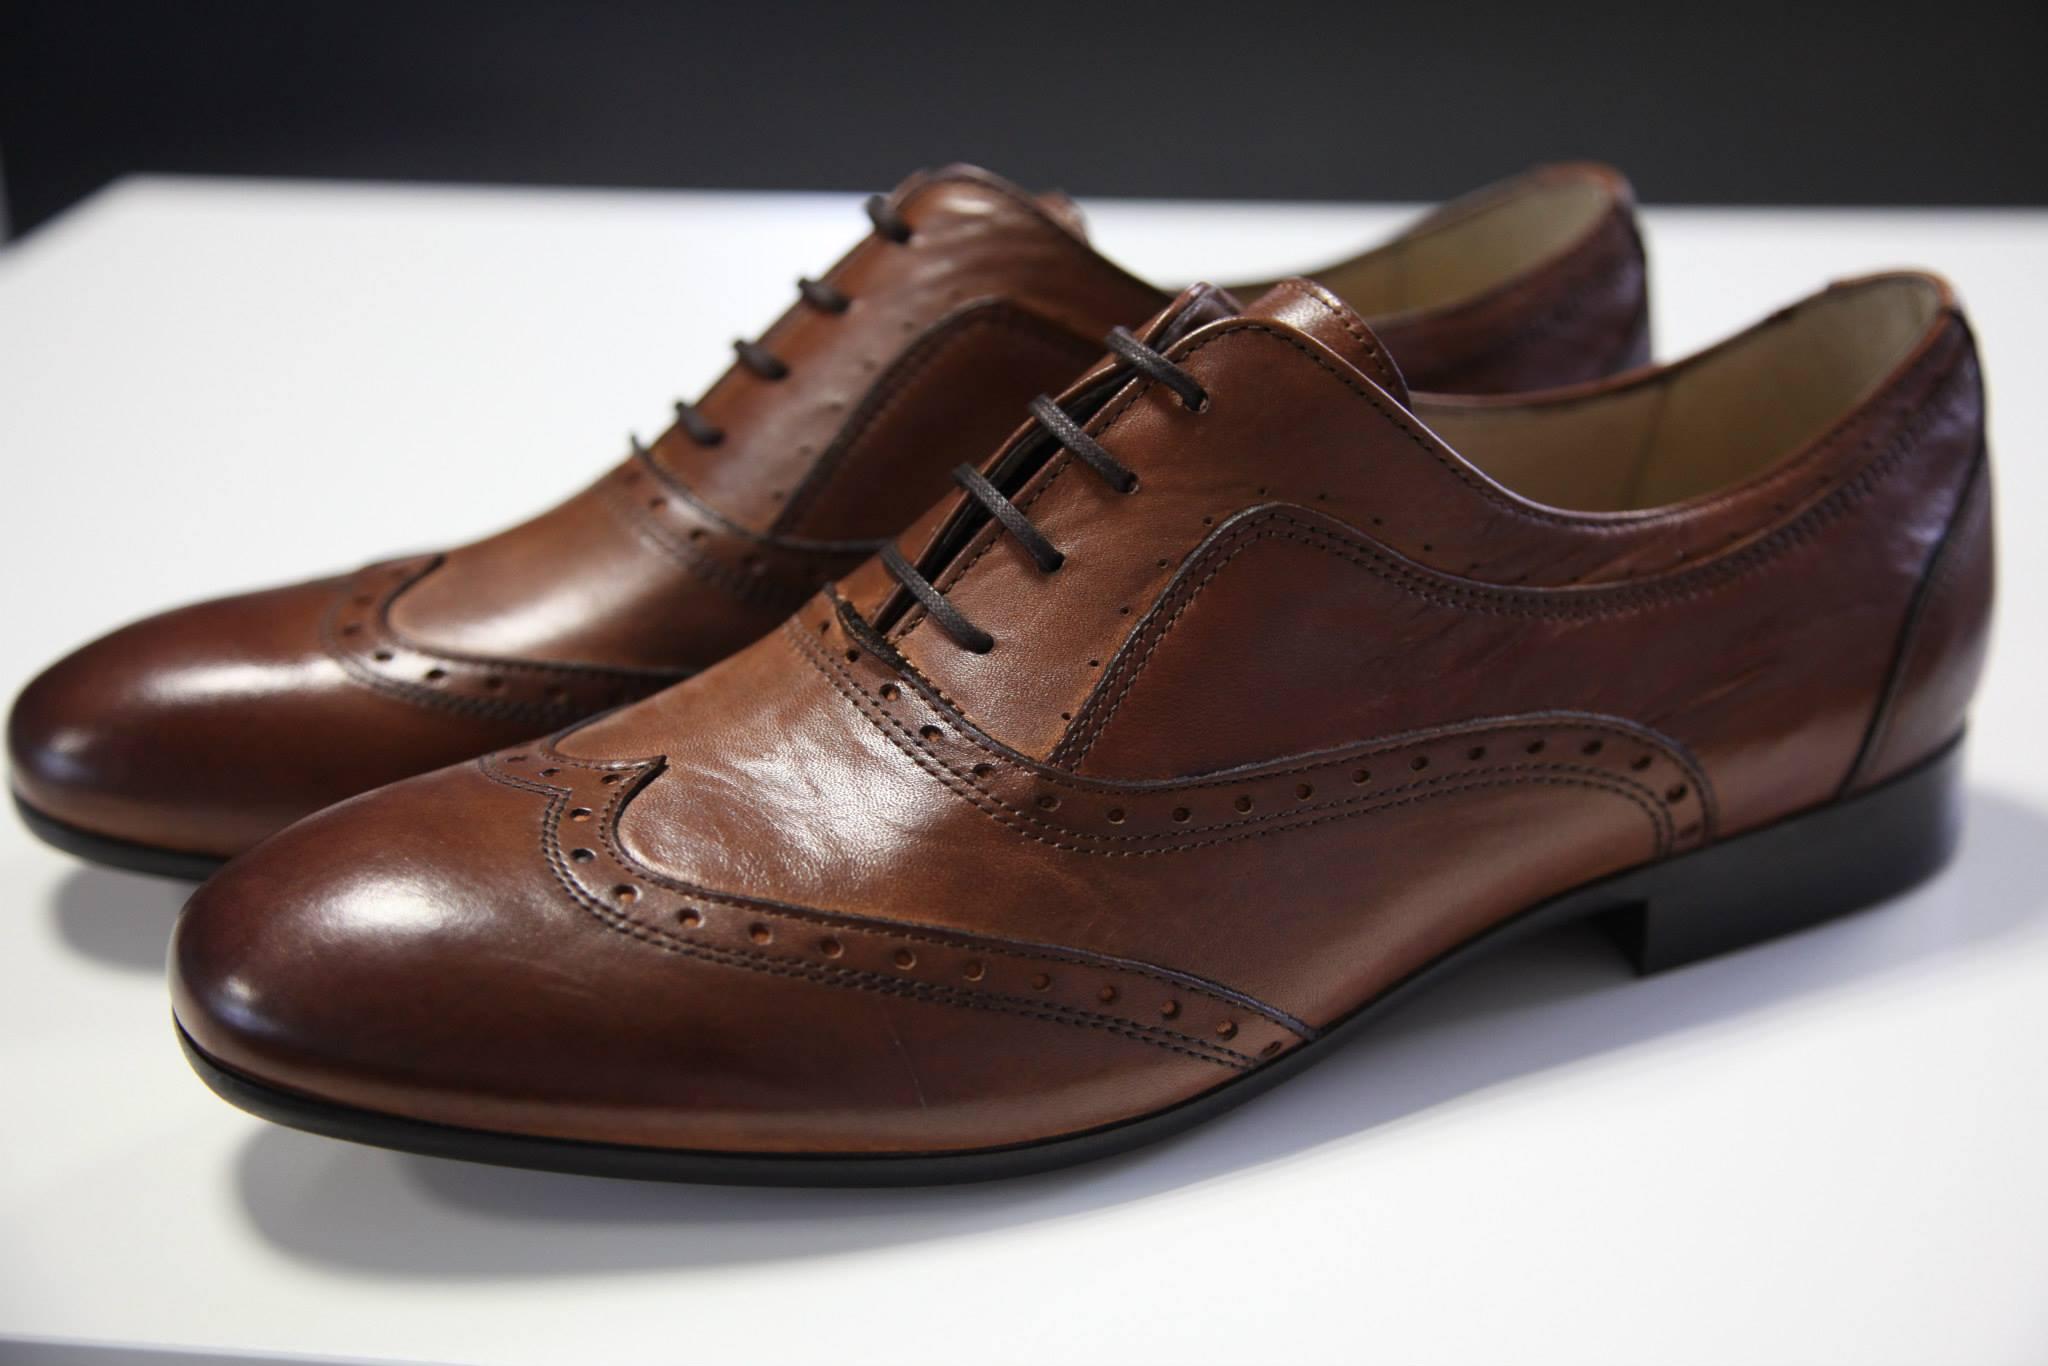 hudson shoes 11270423_1148096871882445_5122608326333912279_o grtuqbp